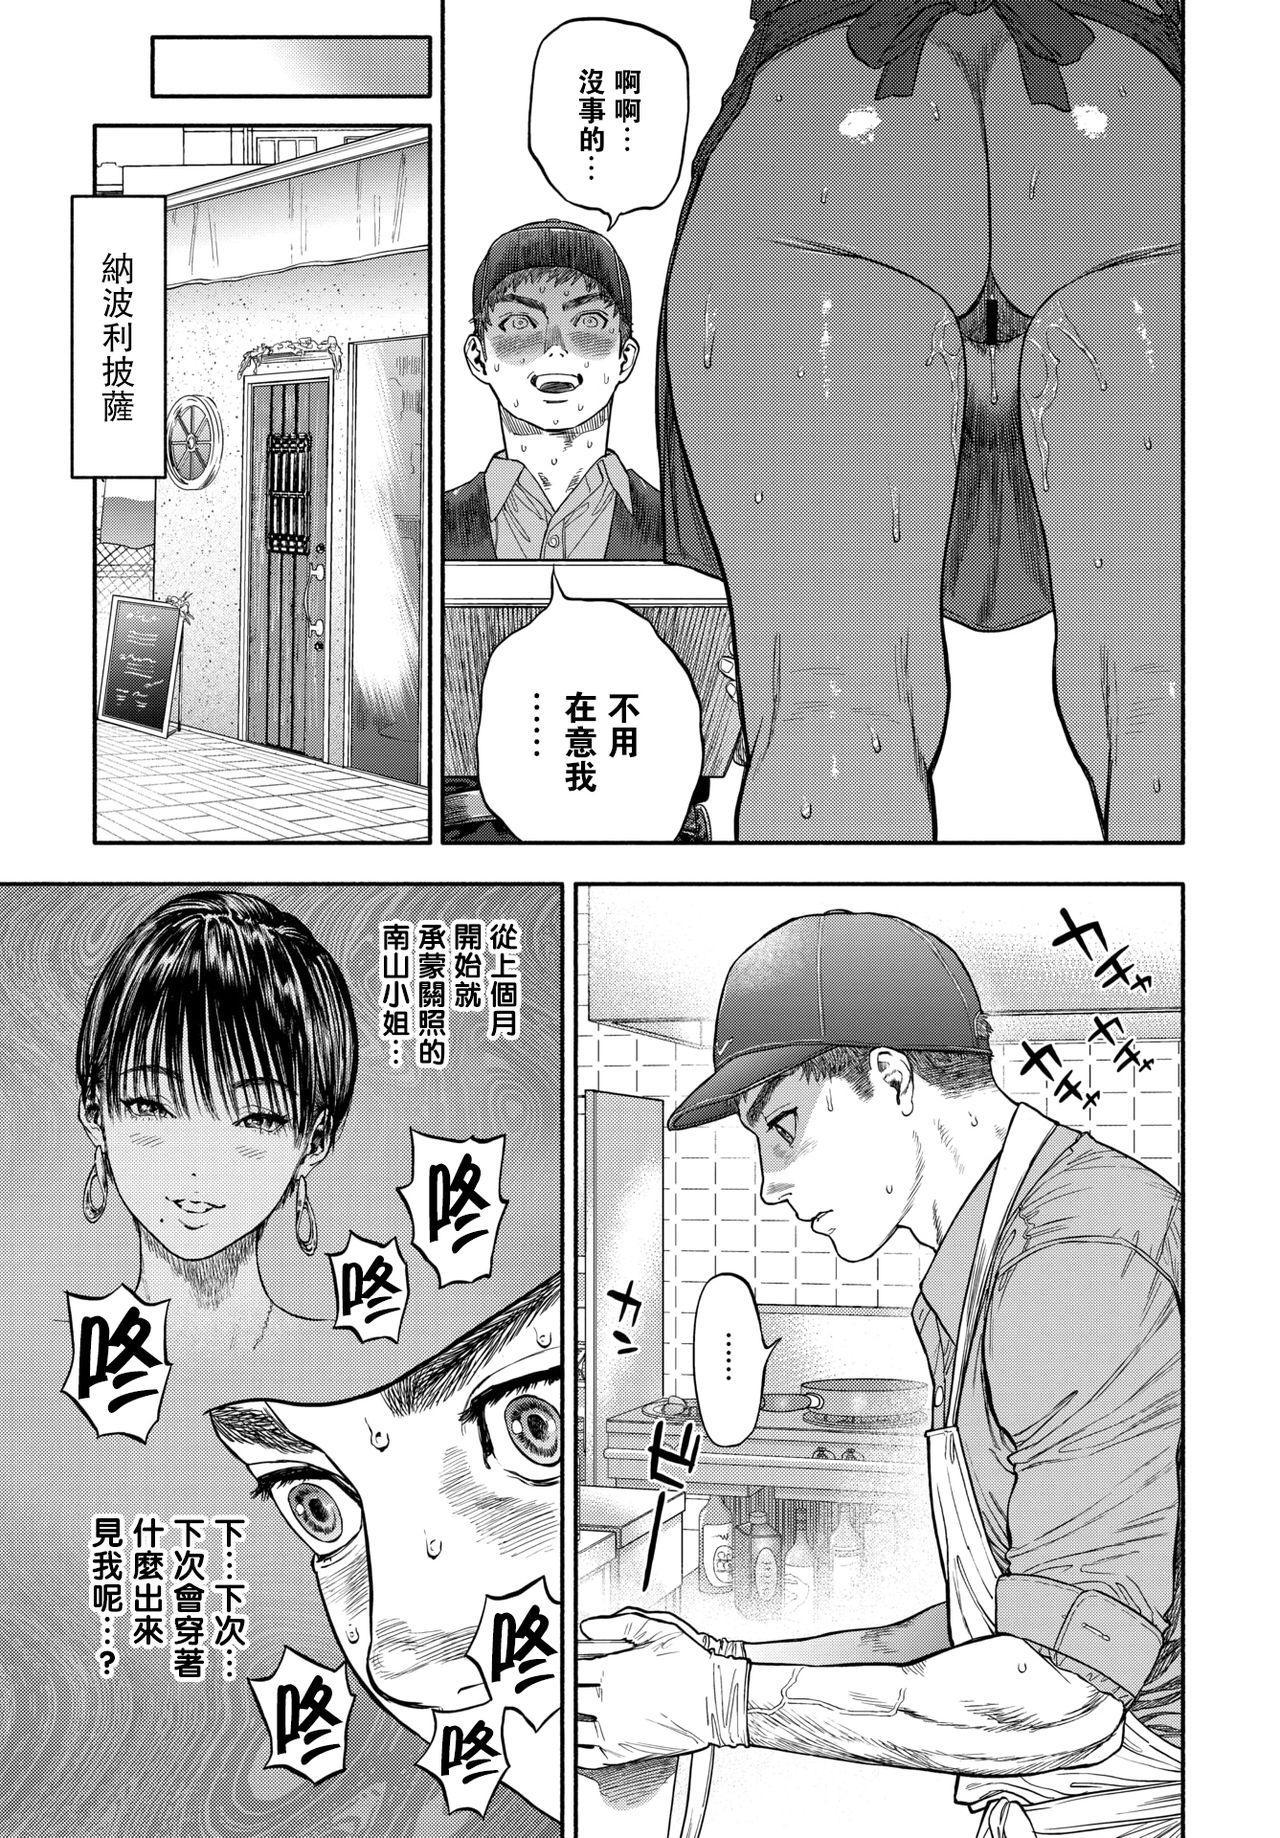 [usa] 45-fun de Kare o Todokete - Delivery Love (COMIC BAVEL 2020-12) [Chinese] [路过的骑士汉化组] [Digital] 20